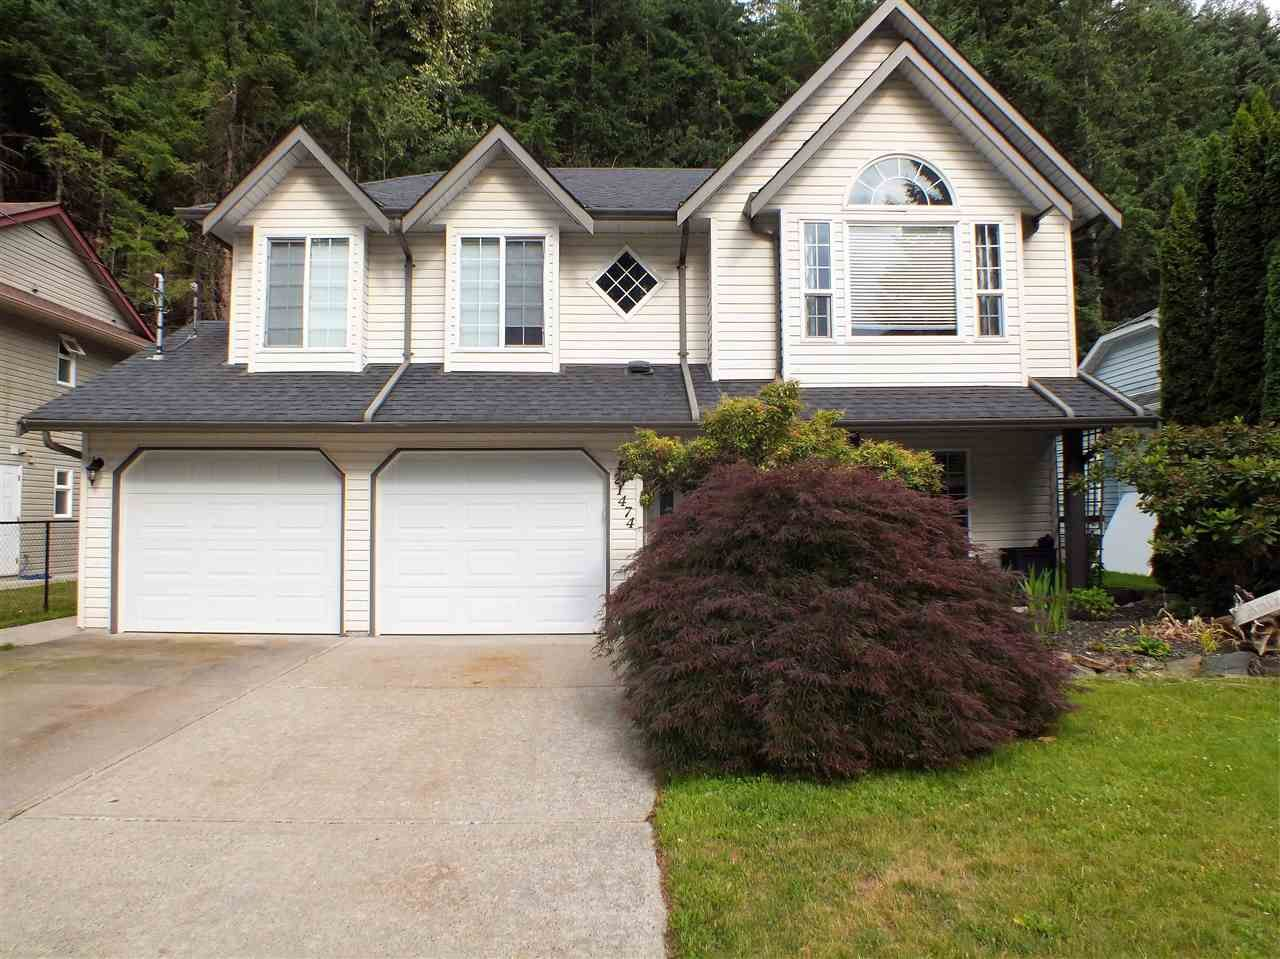 Main Photo: 21474 RICHMOND Drive in Hope: Hope Kawkawa Lake House for sale : MLS®# R2546791